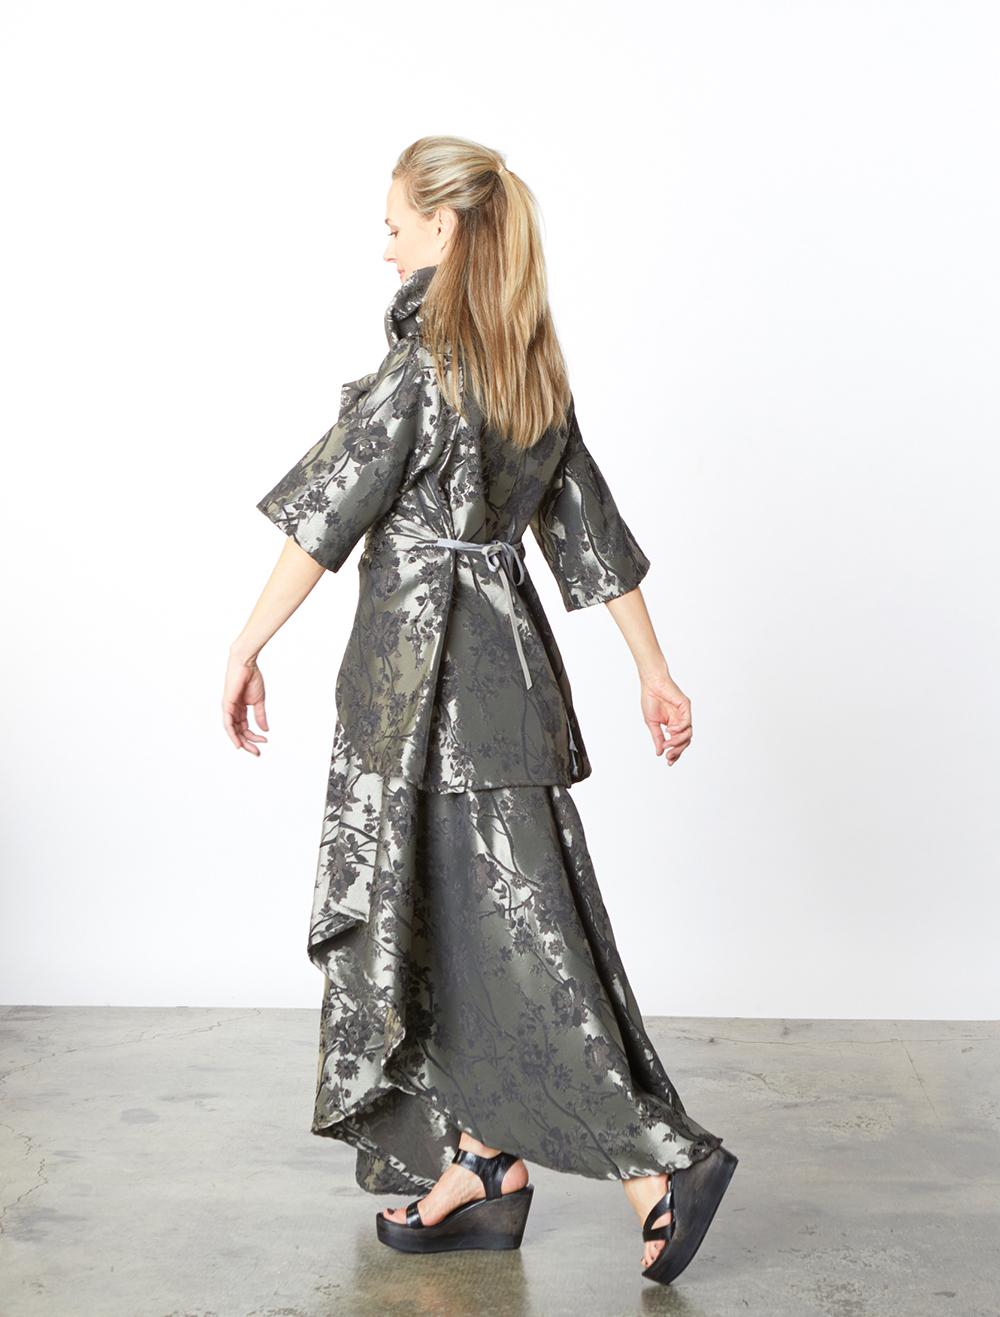 Bowie Jacket, Grange Skirt in Silver Broccatello Fiori